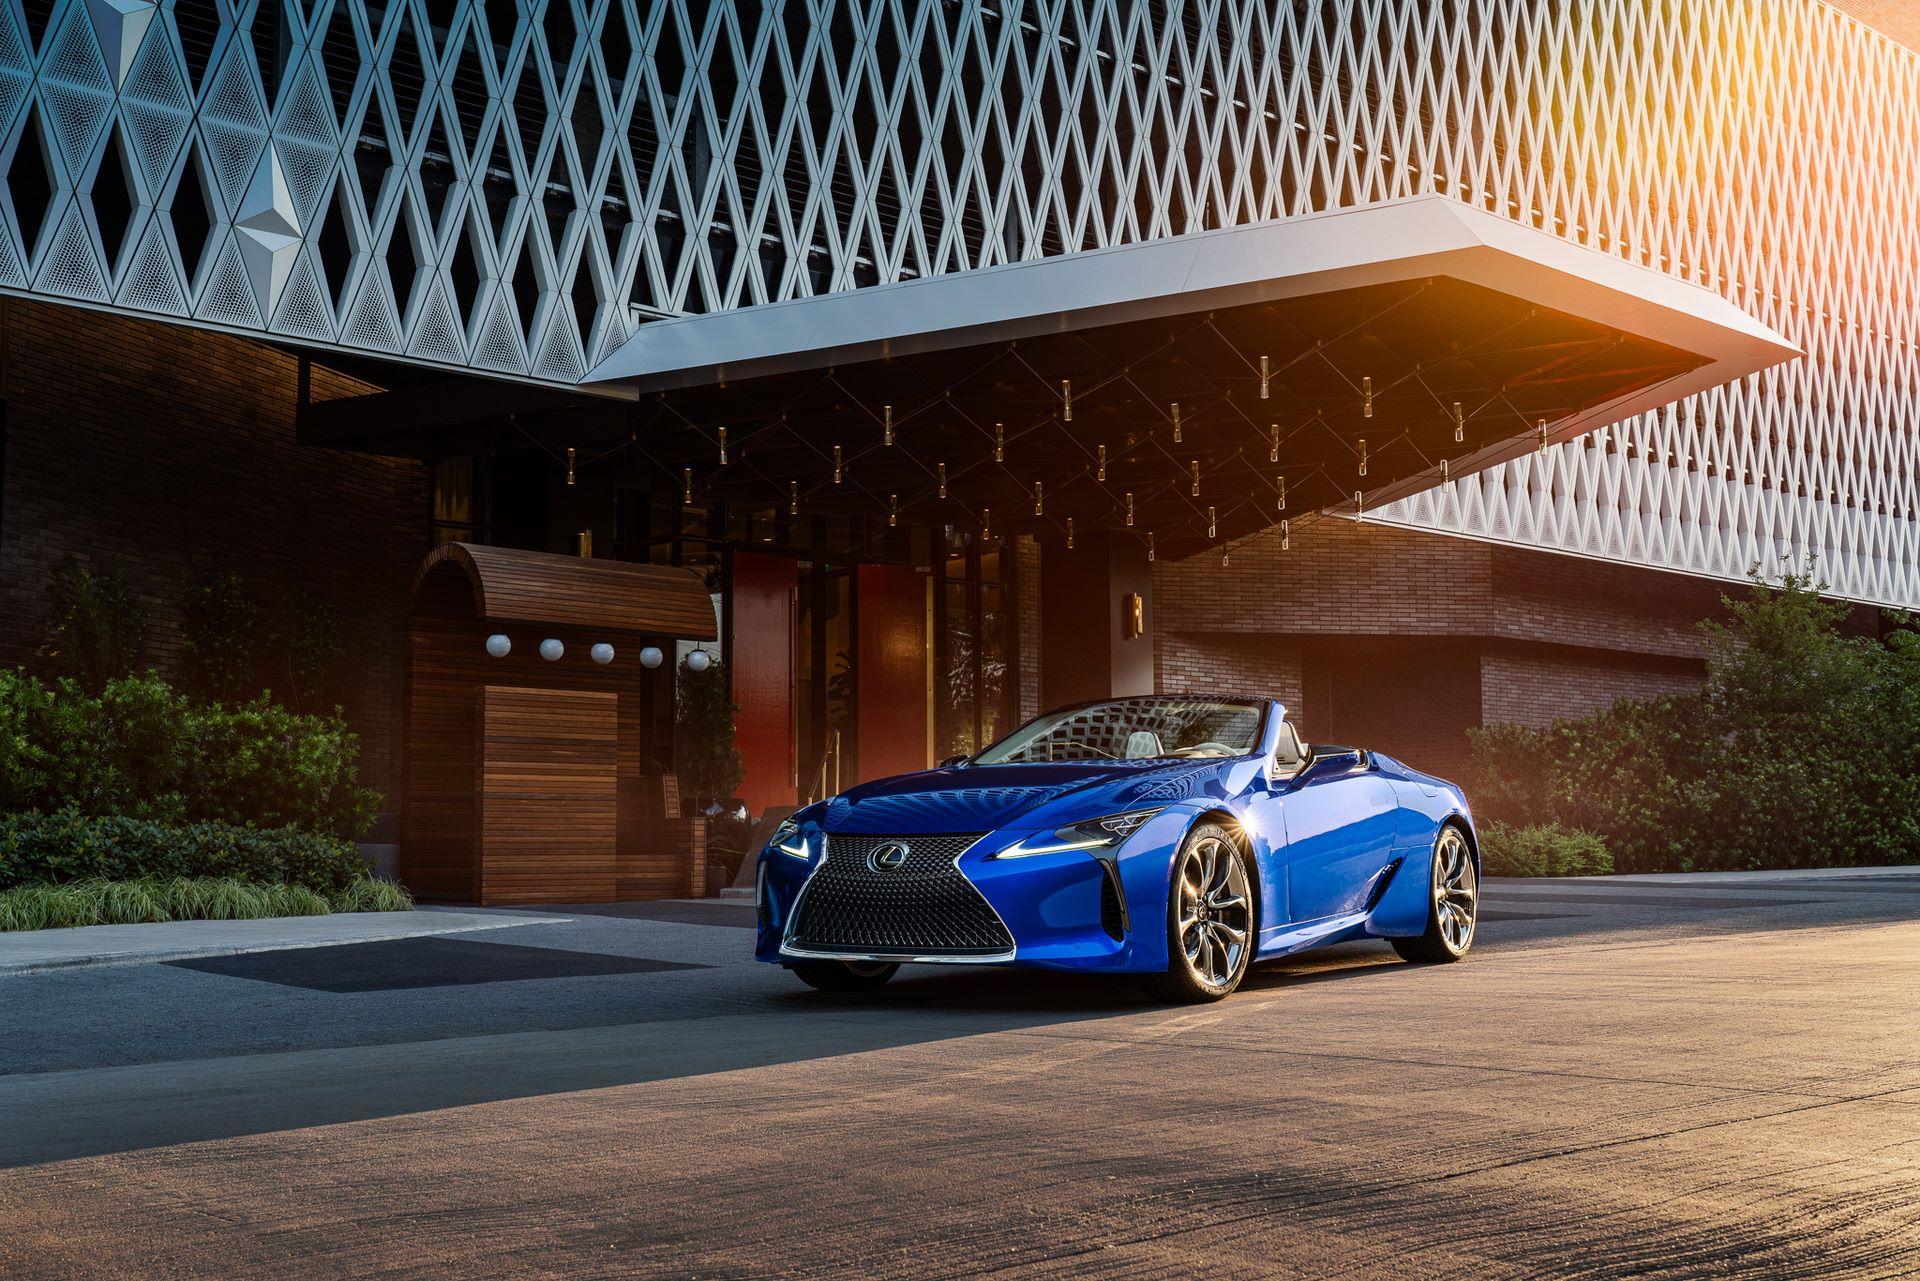 Lexus-LC-500-Convertible-Regatta-Edition-15